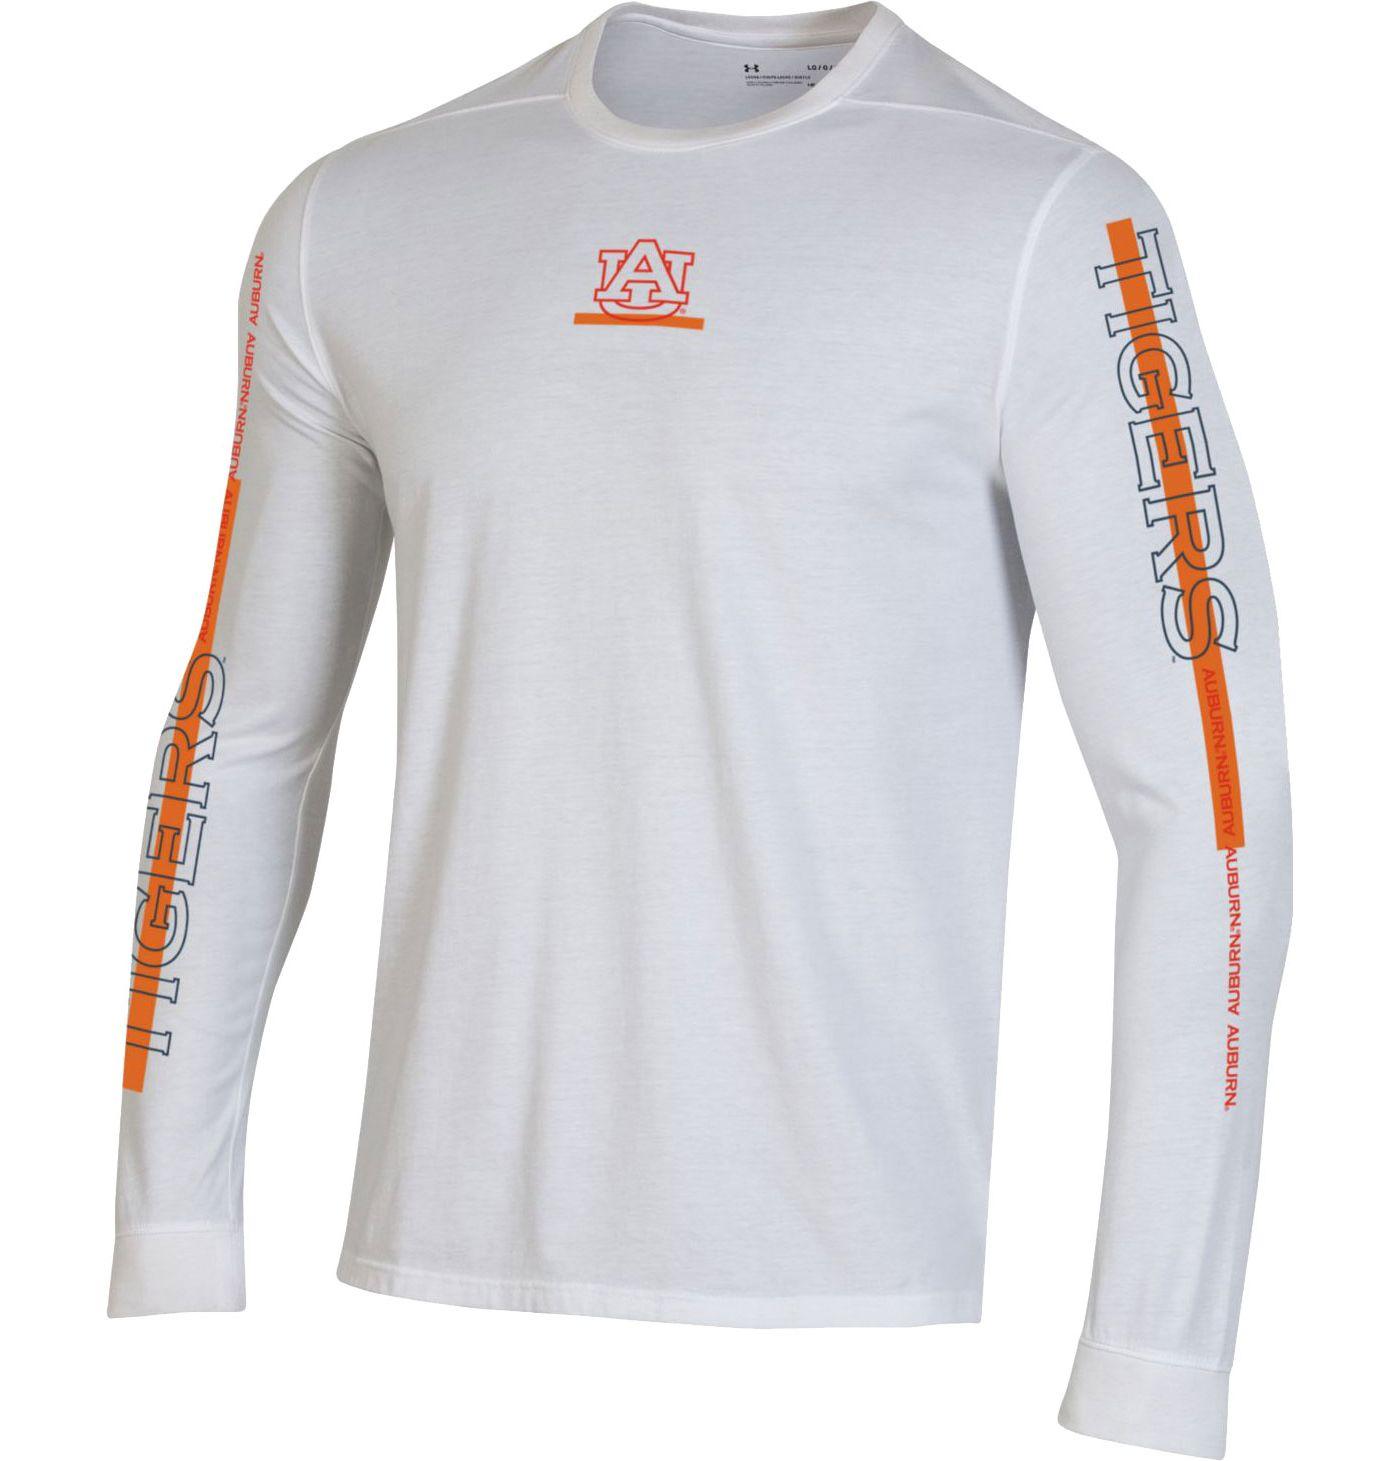 Under Armour Men's Auburn Tigers Hype On-Court Long Sleeve Basketball White T-Shirt